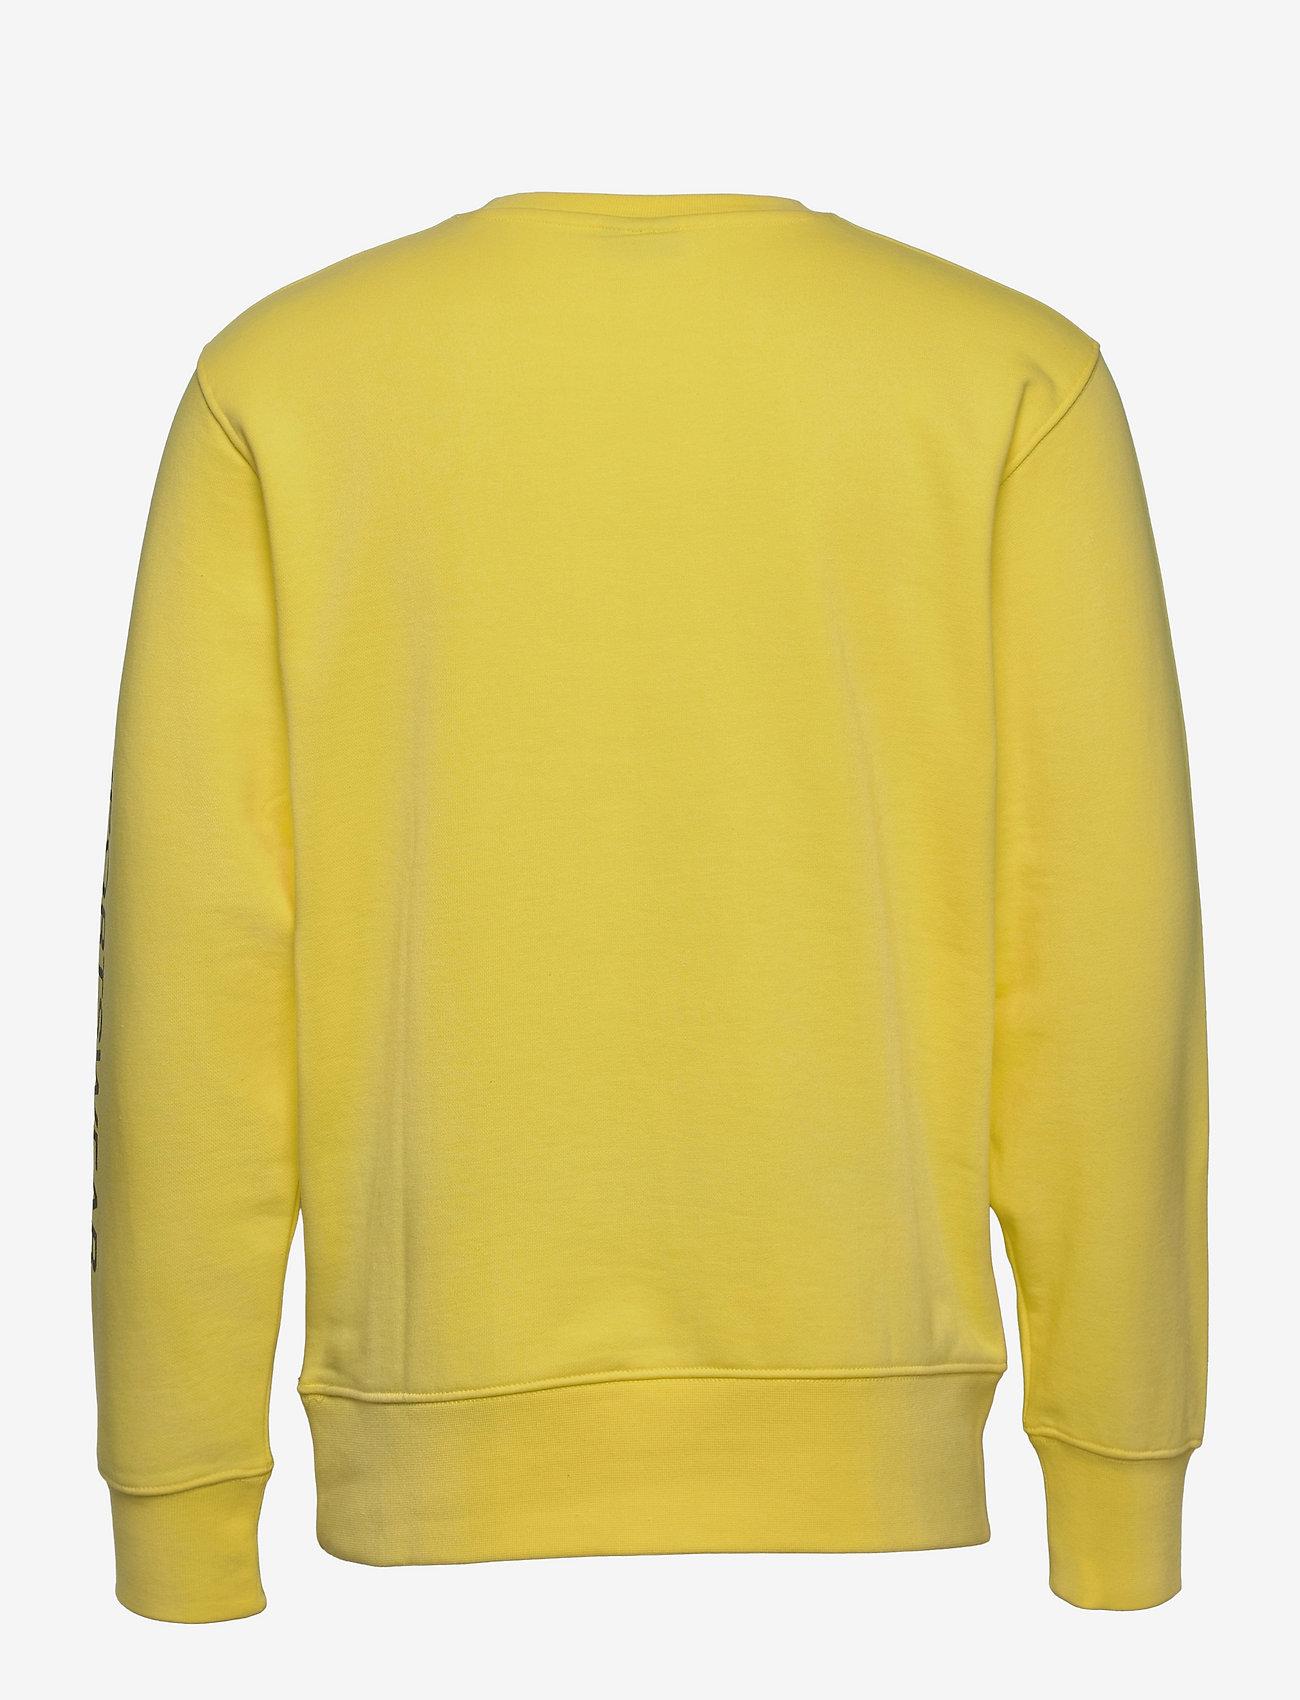 H2O - Anholt Sweat O'neck - yläosat - light yellow - 1